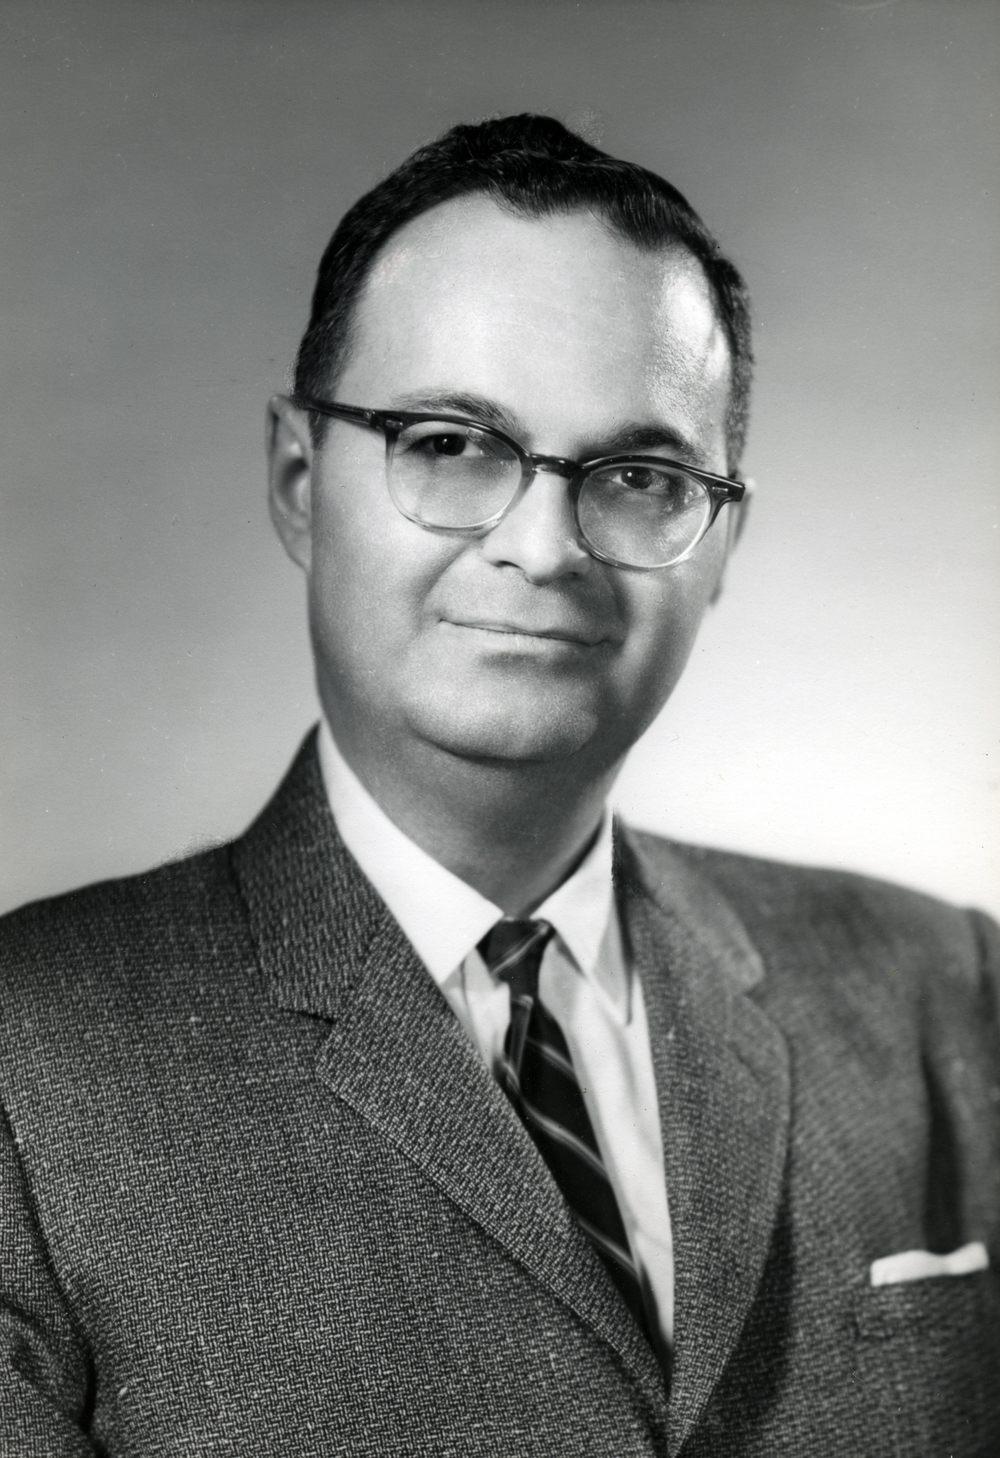 Roger E. Joseph, c. 1965